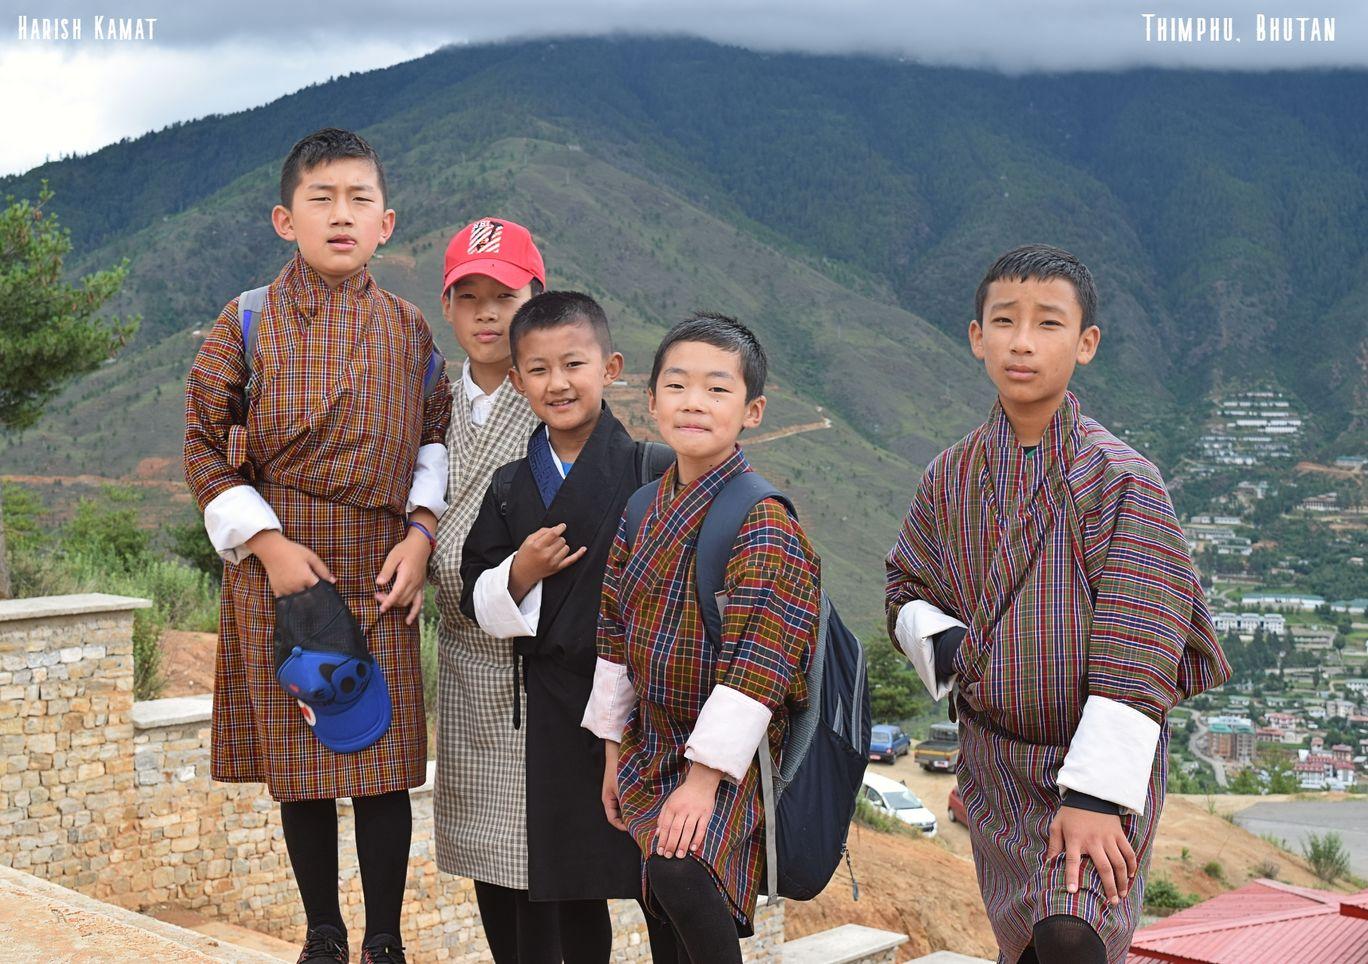 Photo of Bhutan By Harish Kamat